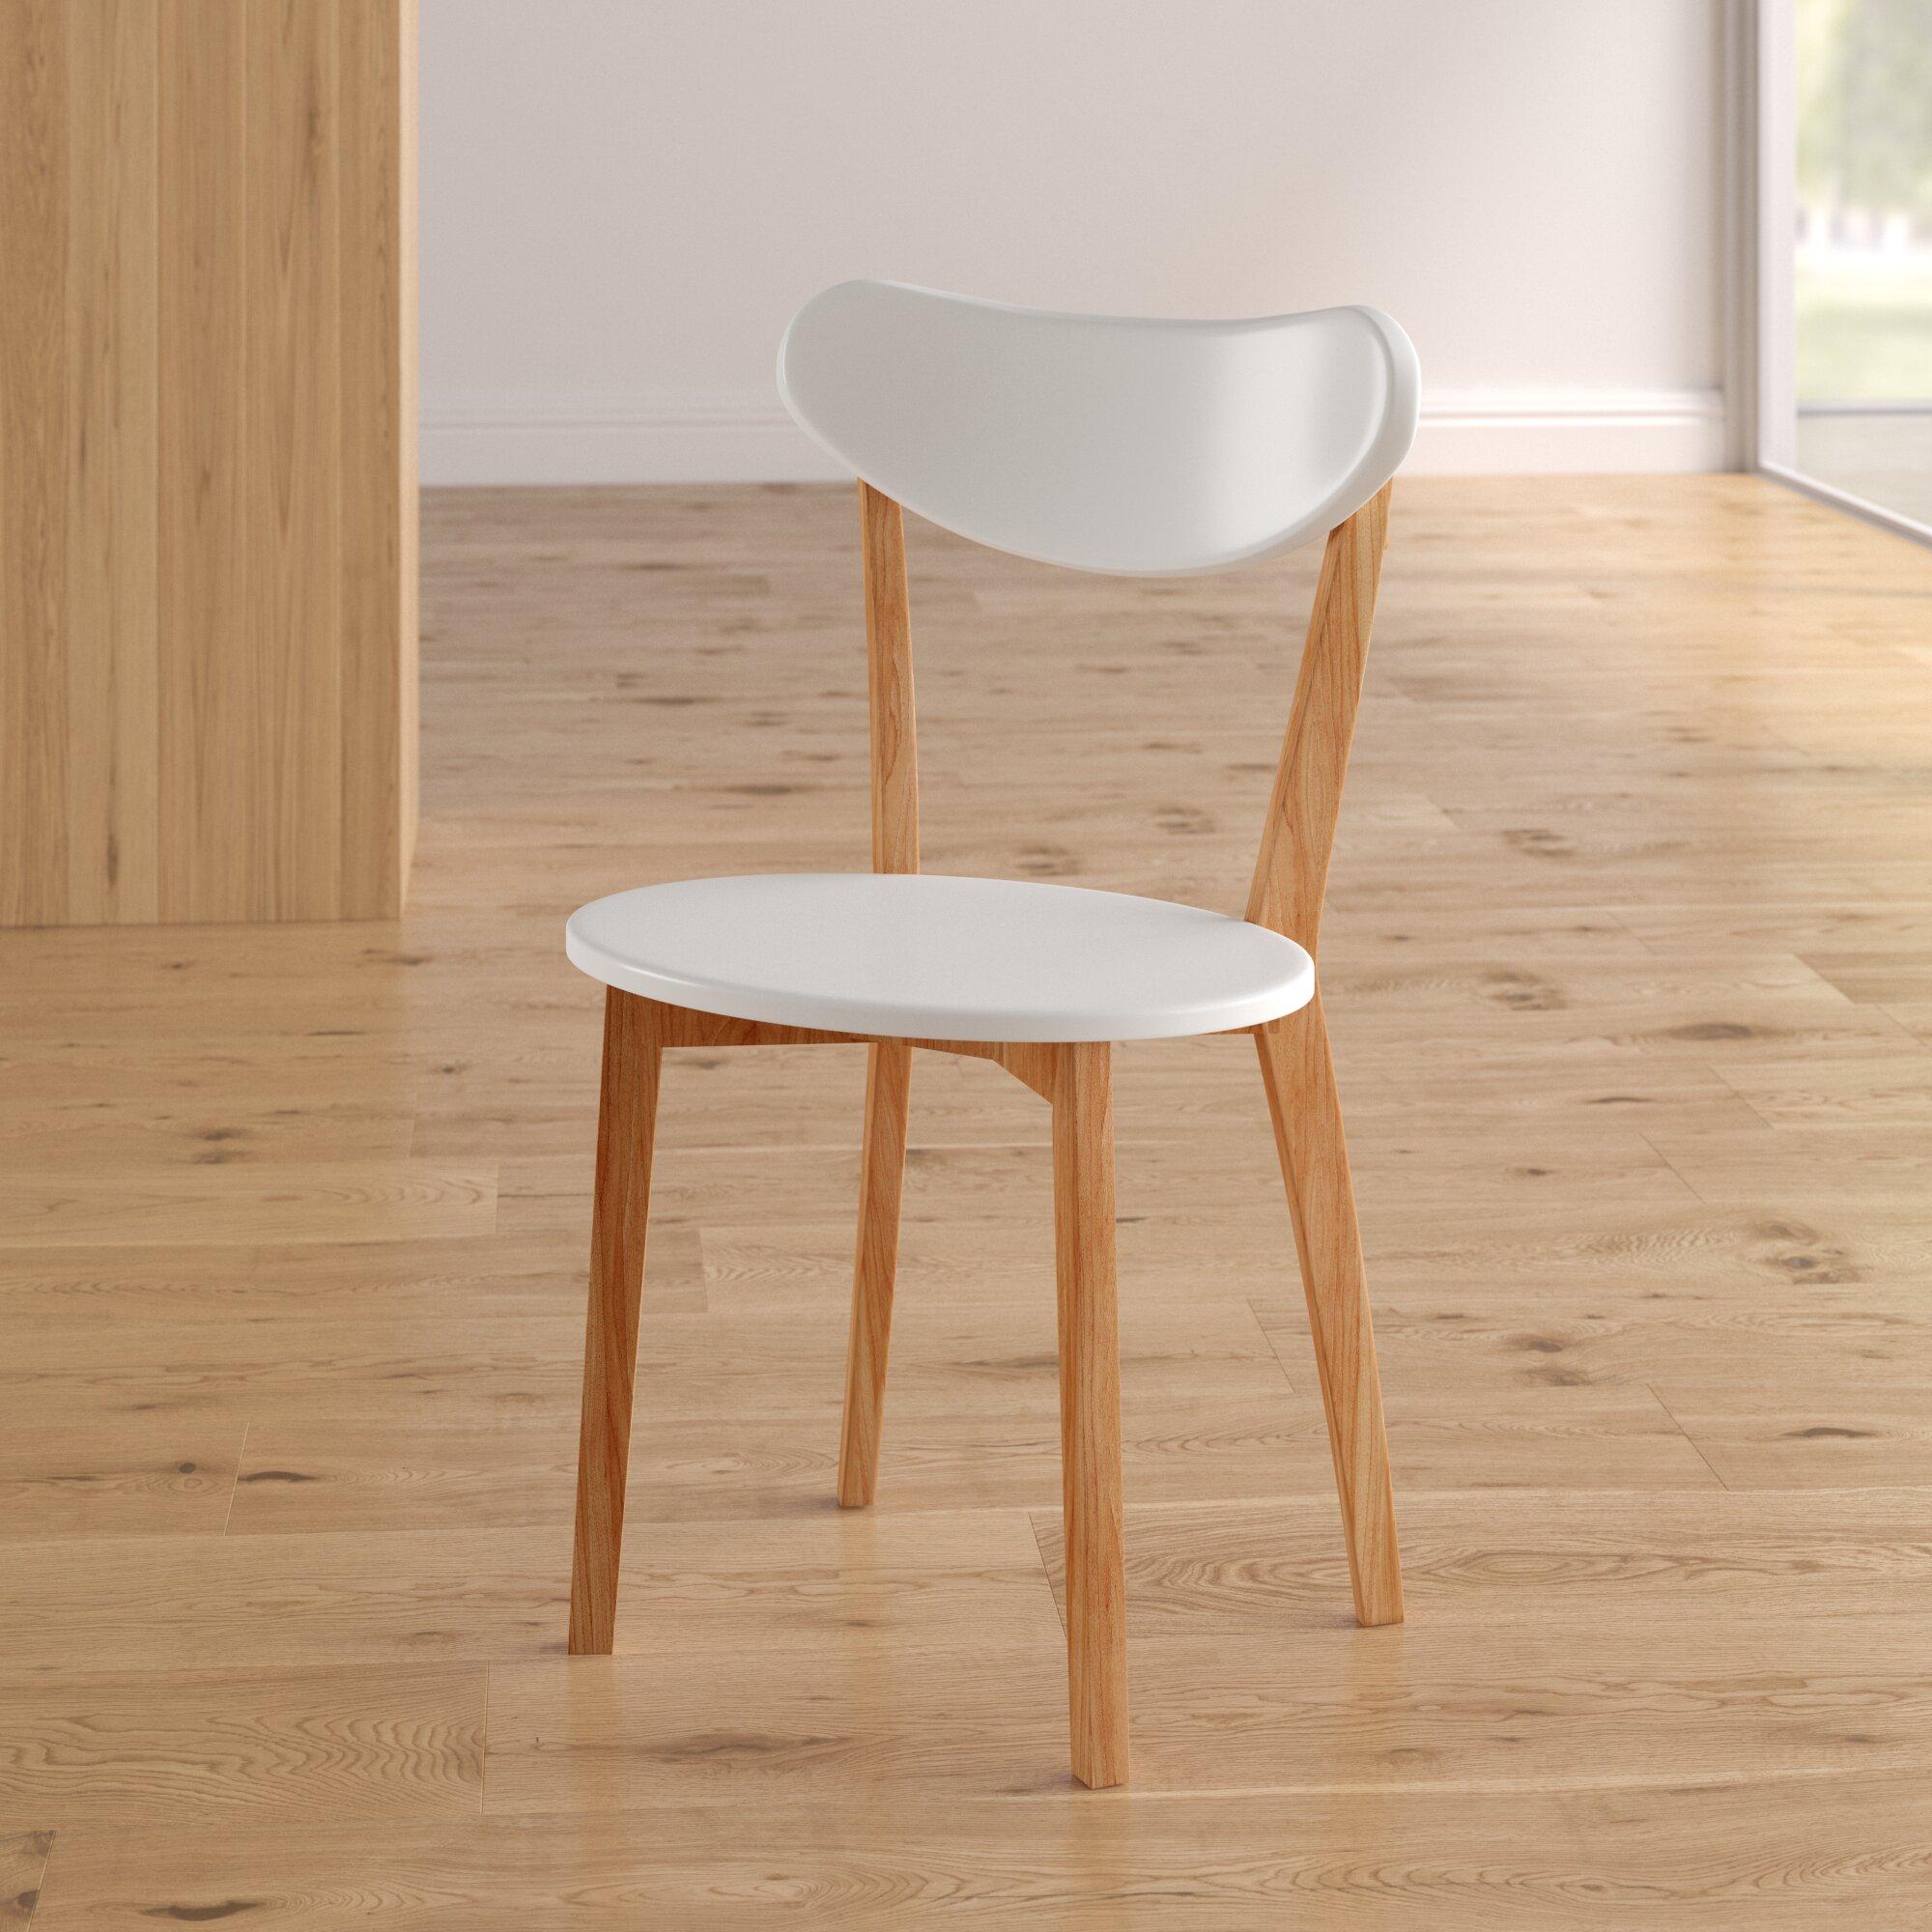 Brayden Studio Bryant Retro Modern Upholstered Dining Chair Reviews Wayfair